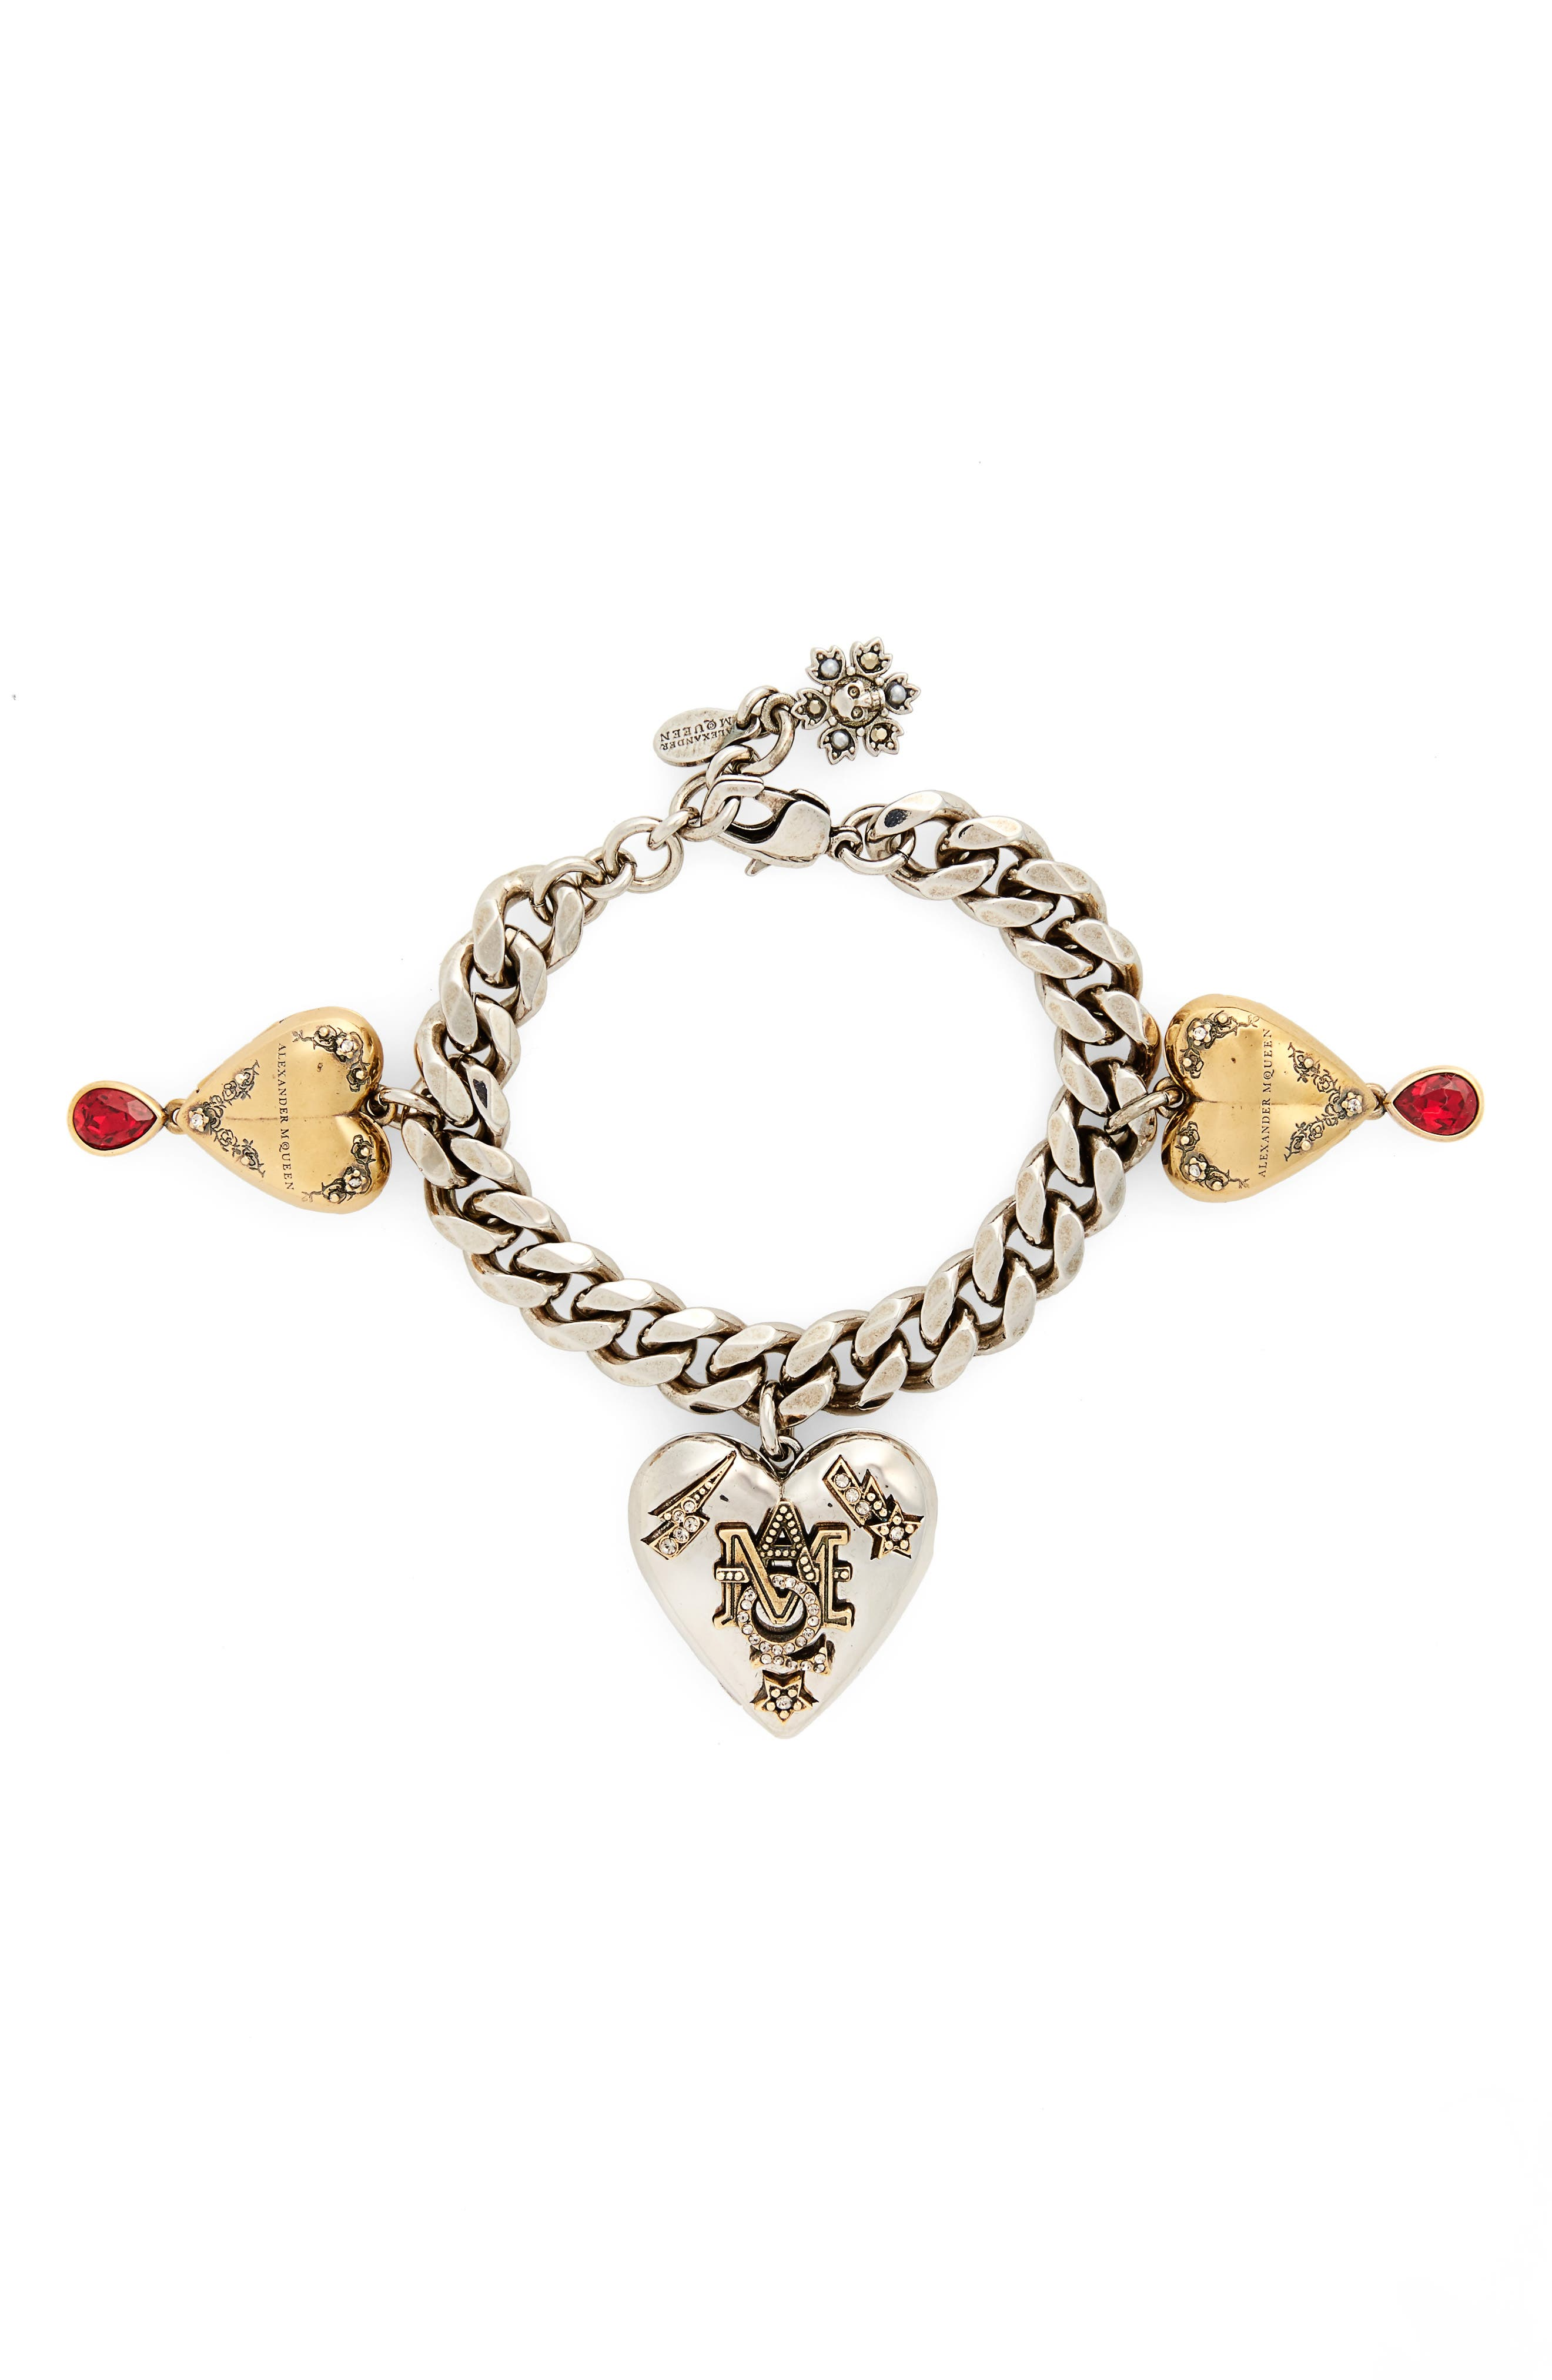 Main Image - Alexander McQueen Heart Charm Bracelet